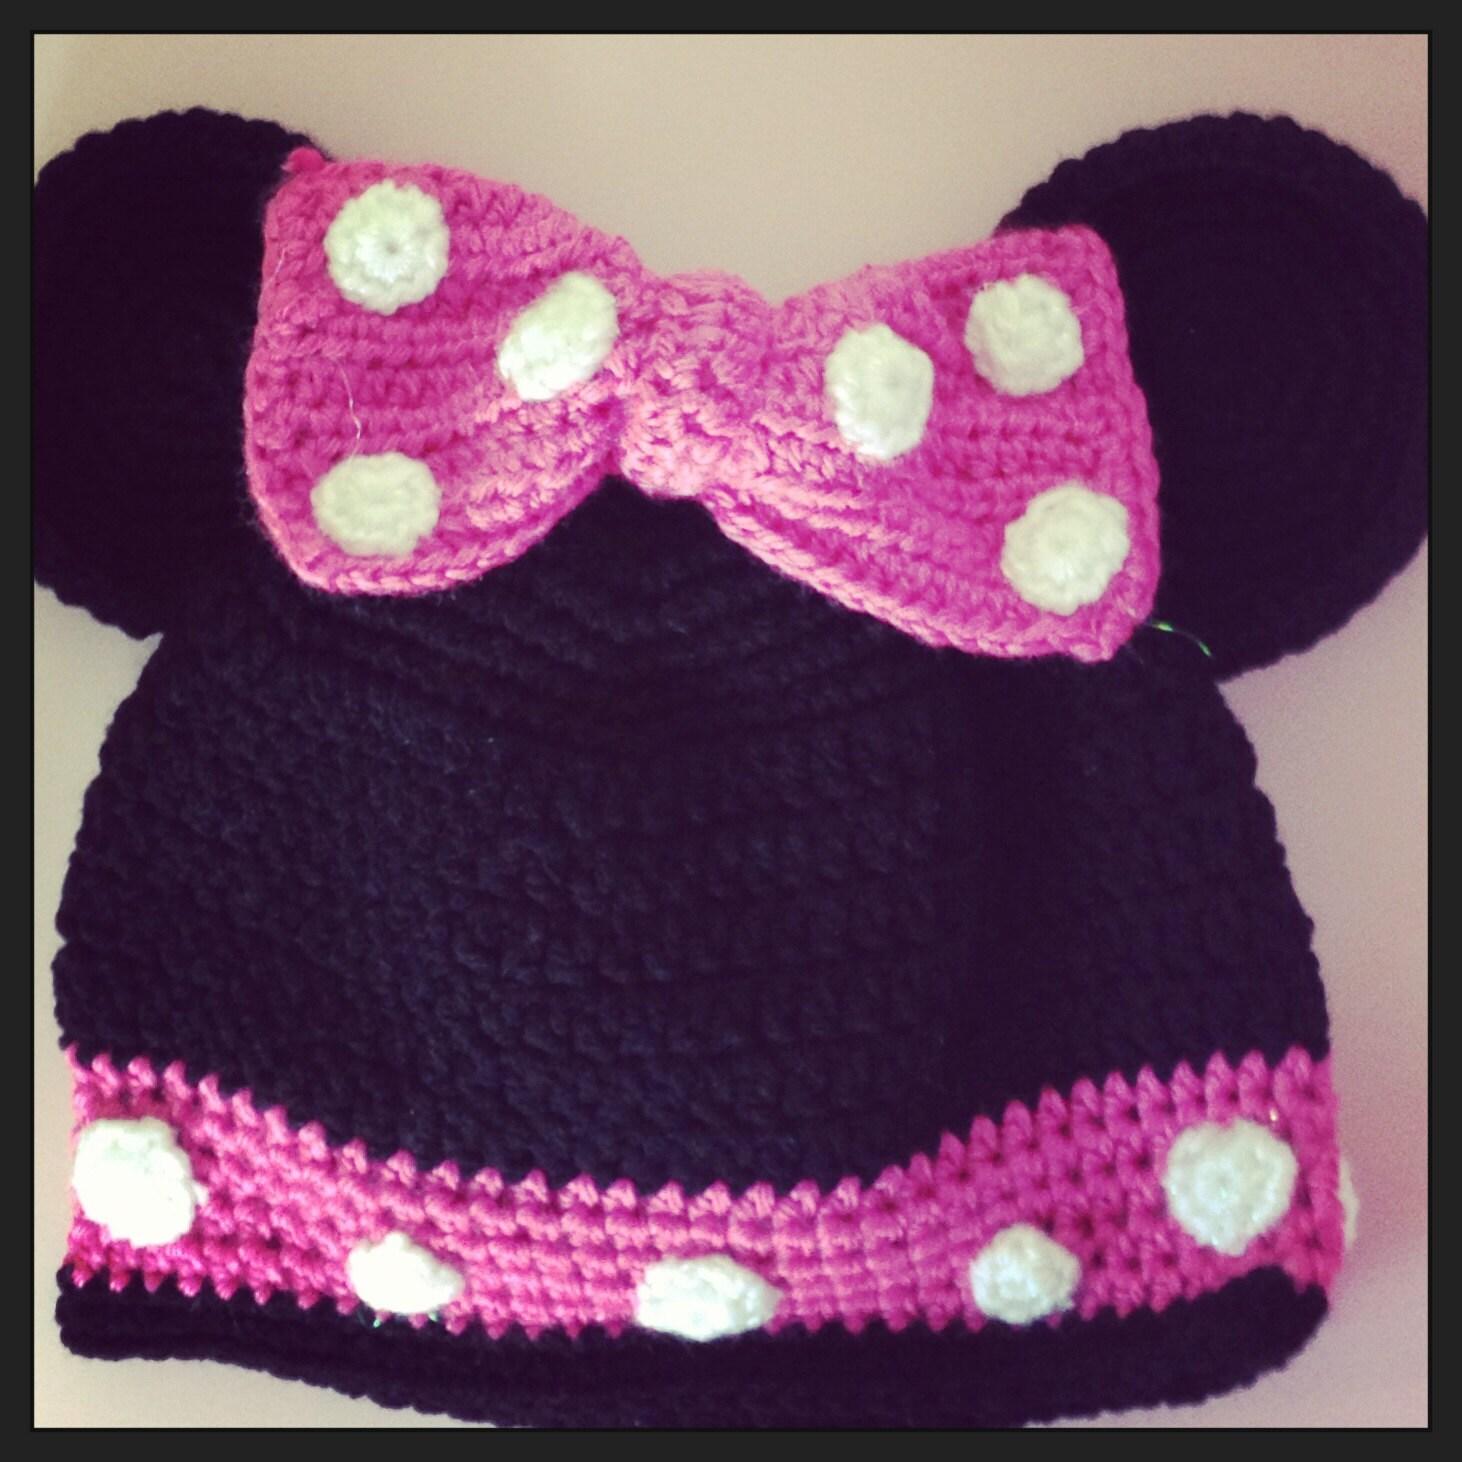 Minnie Mouse Crochet Hat Pattern Child : Crochet Minnie Mouse Hat Childrens or Infants Minnie Mouse